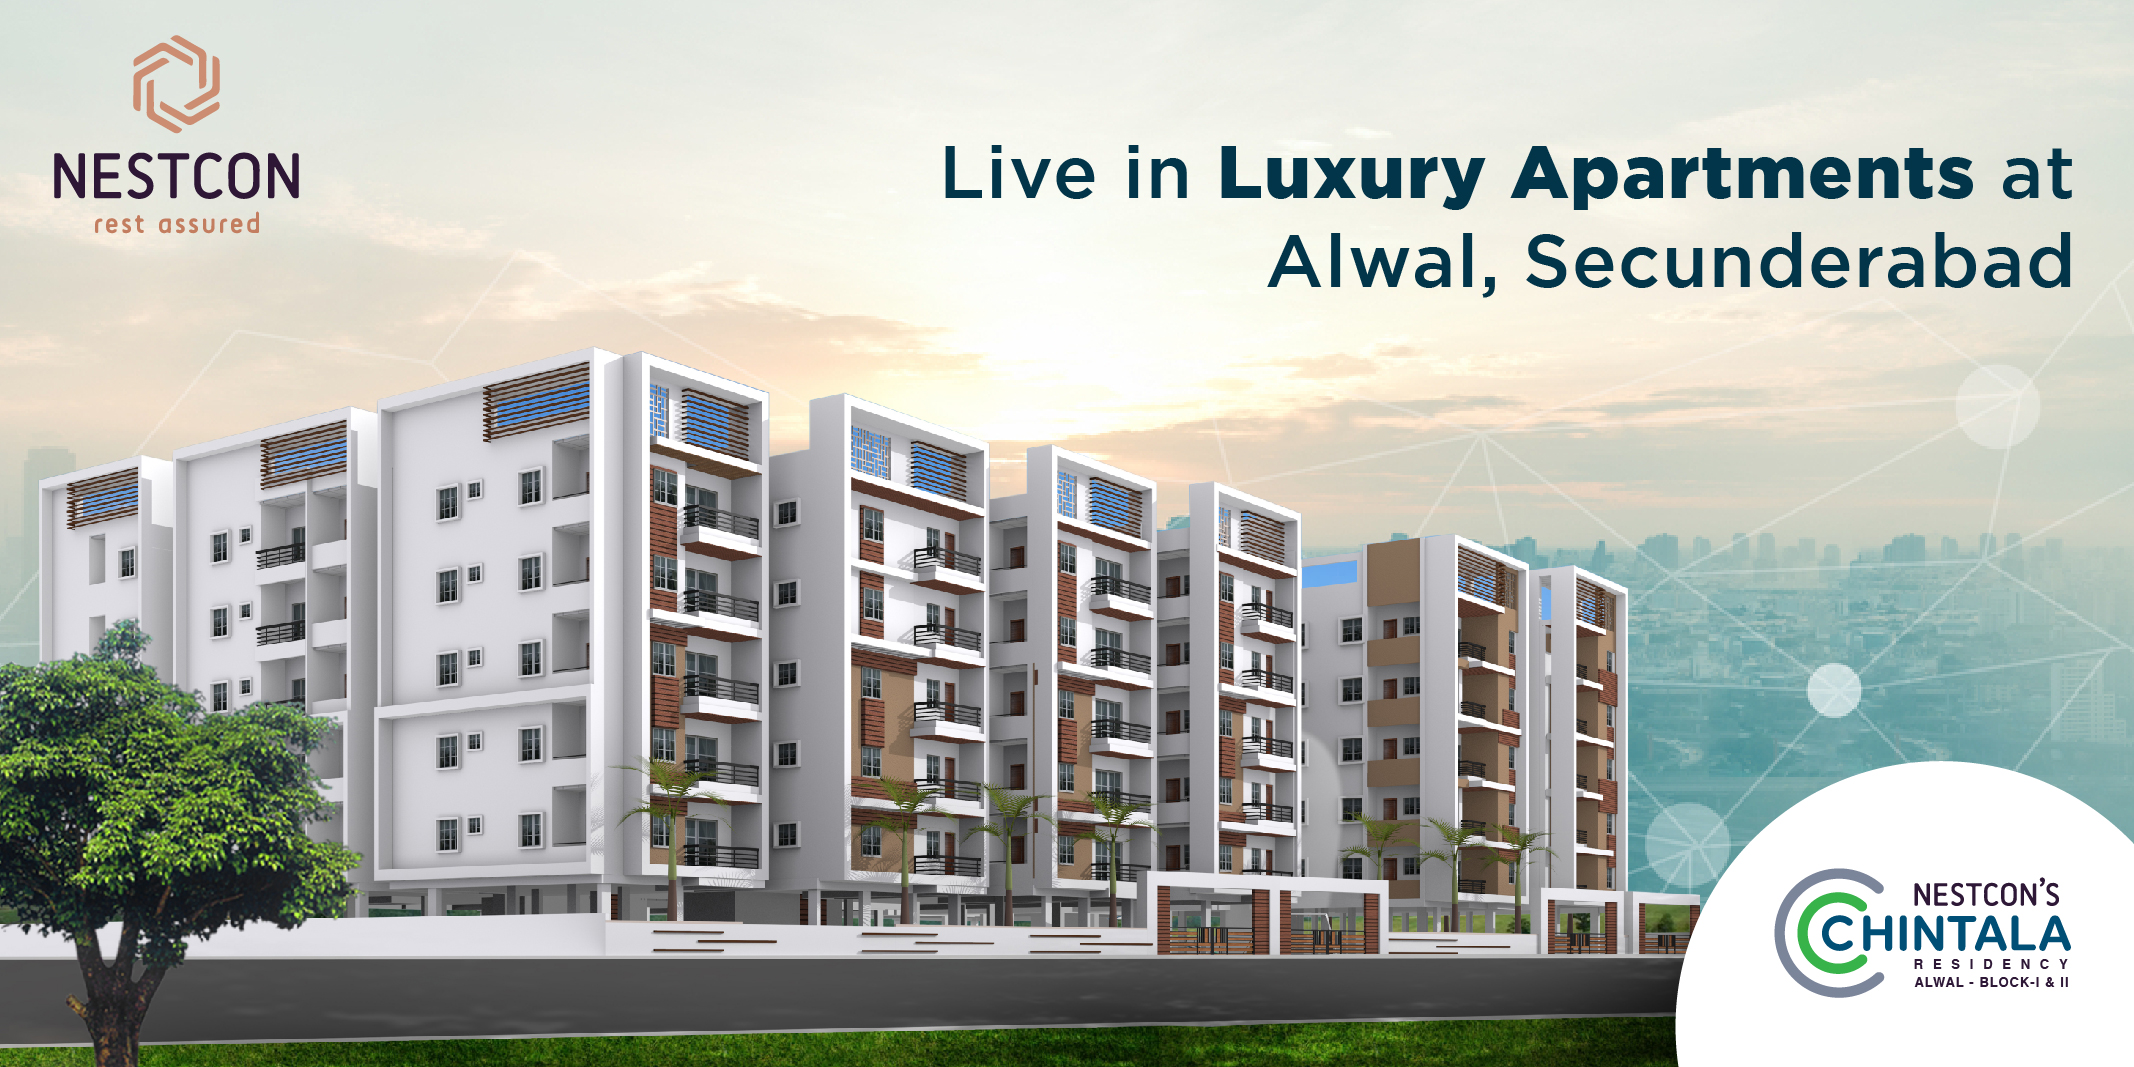 2 bhk & 3 bhk luxury apartments in alwal